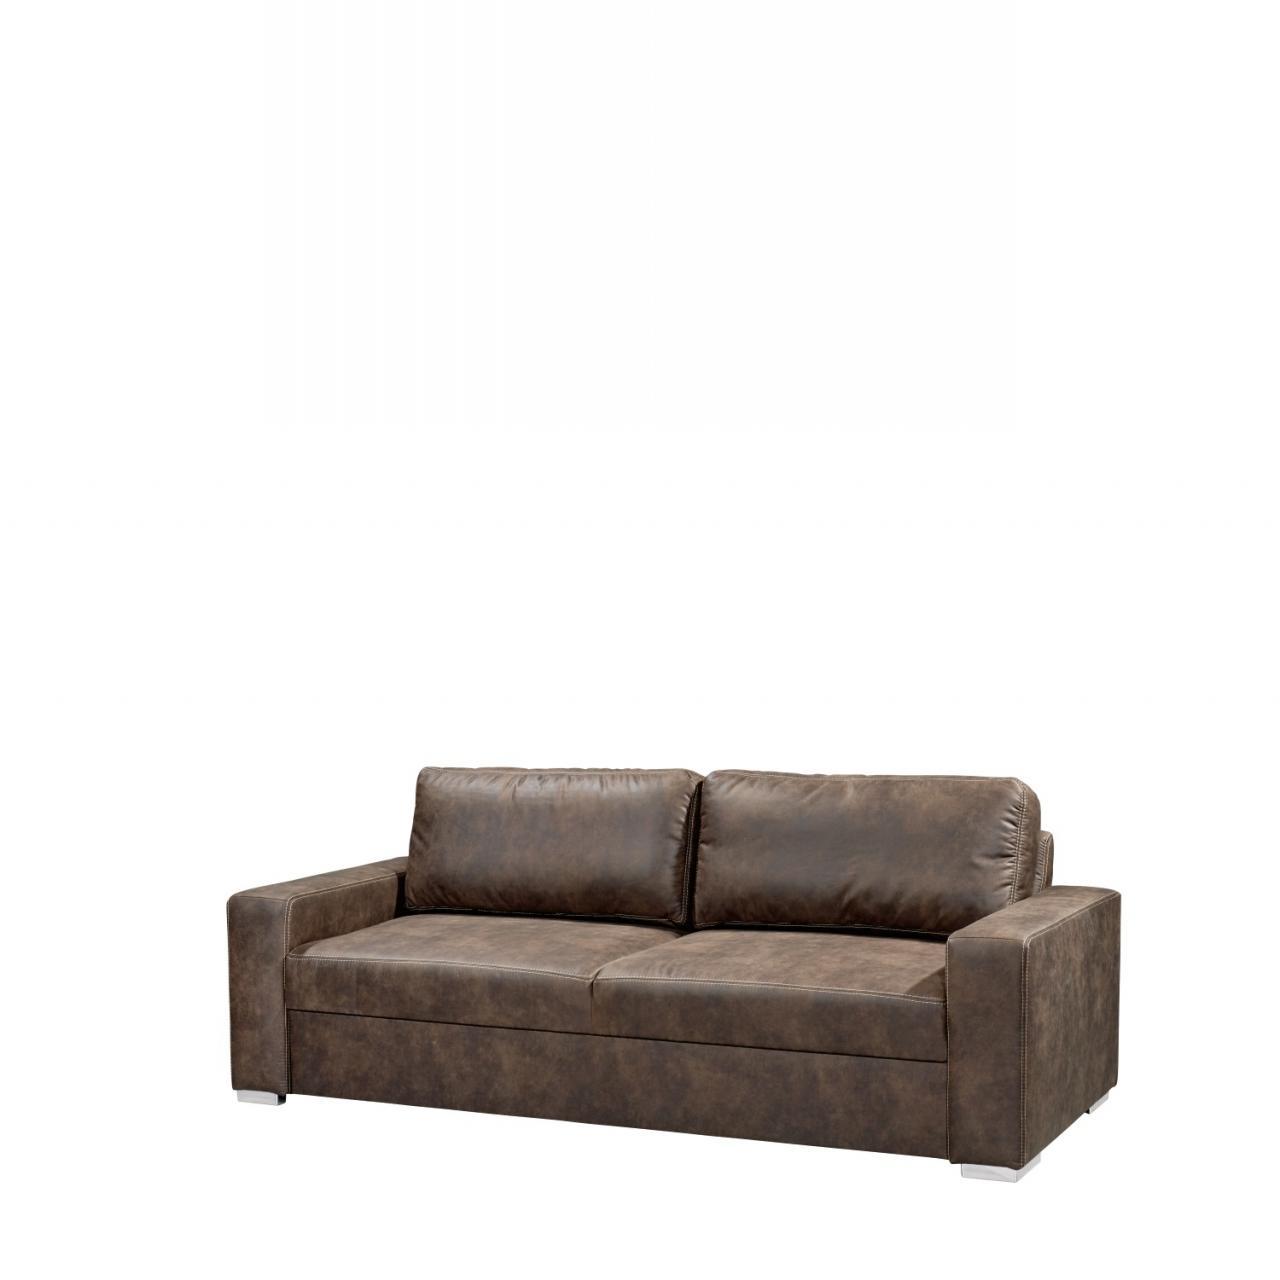 3er Sofa Regina Sofa Dunkelbraun Polstergarnitur Couch inkl. Rückenkissen